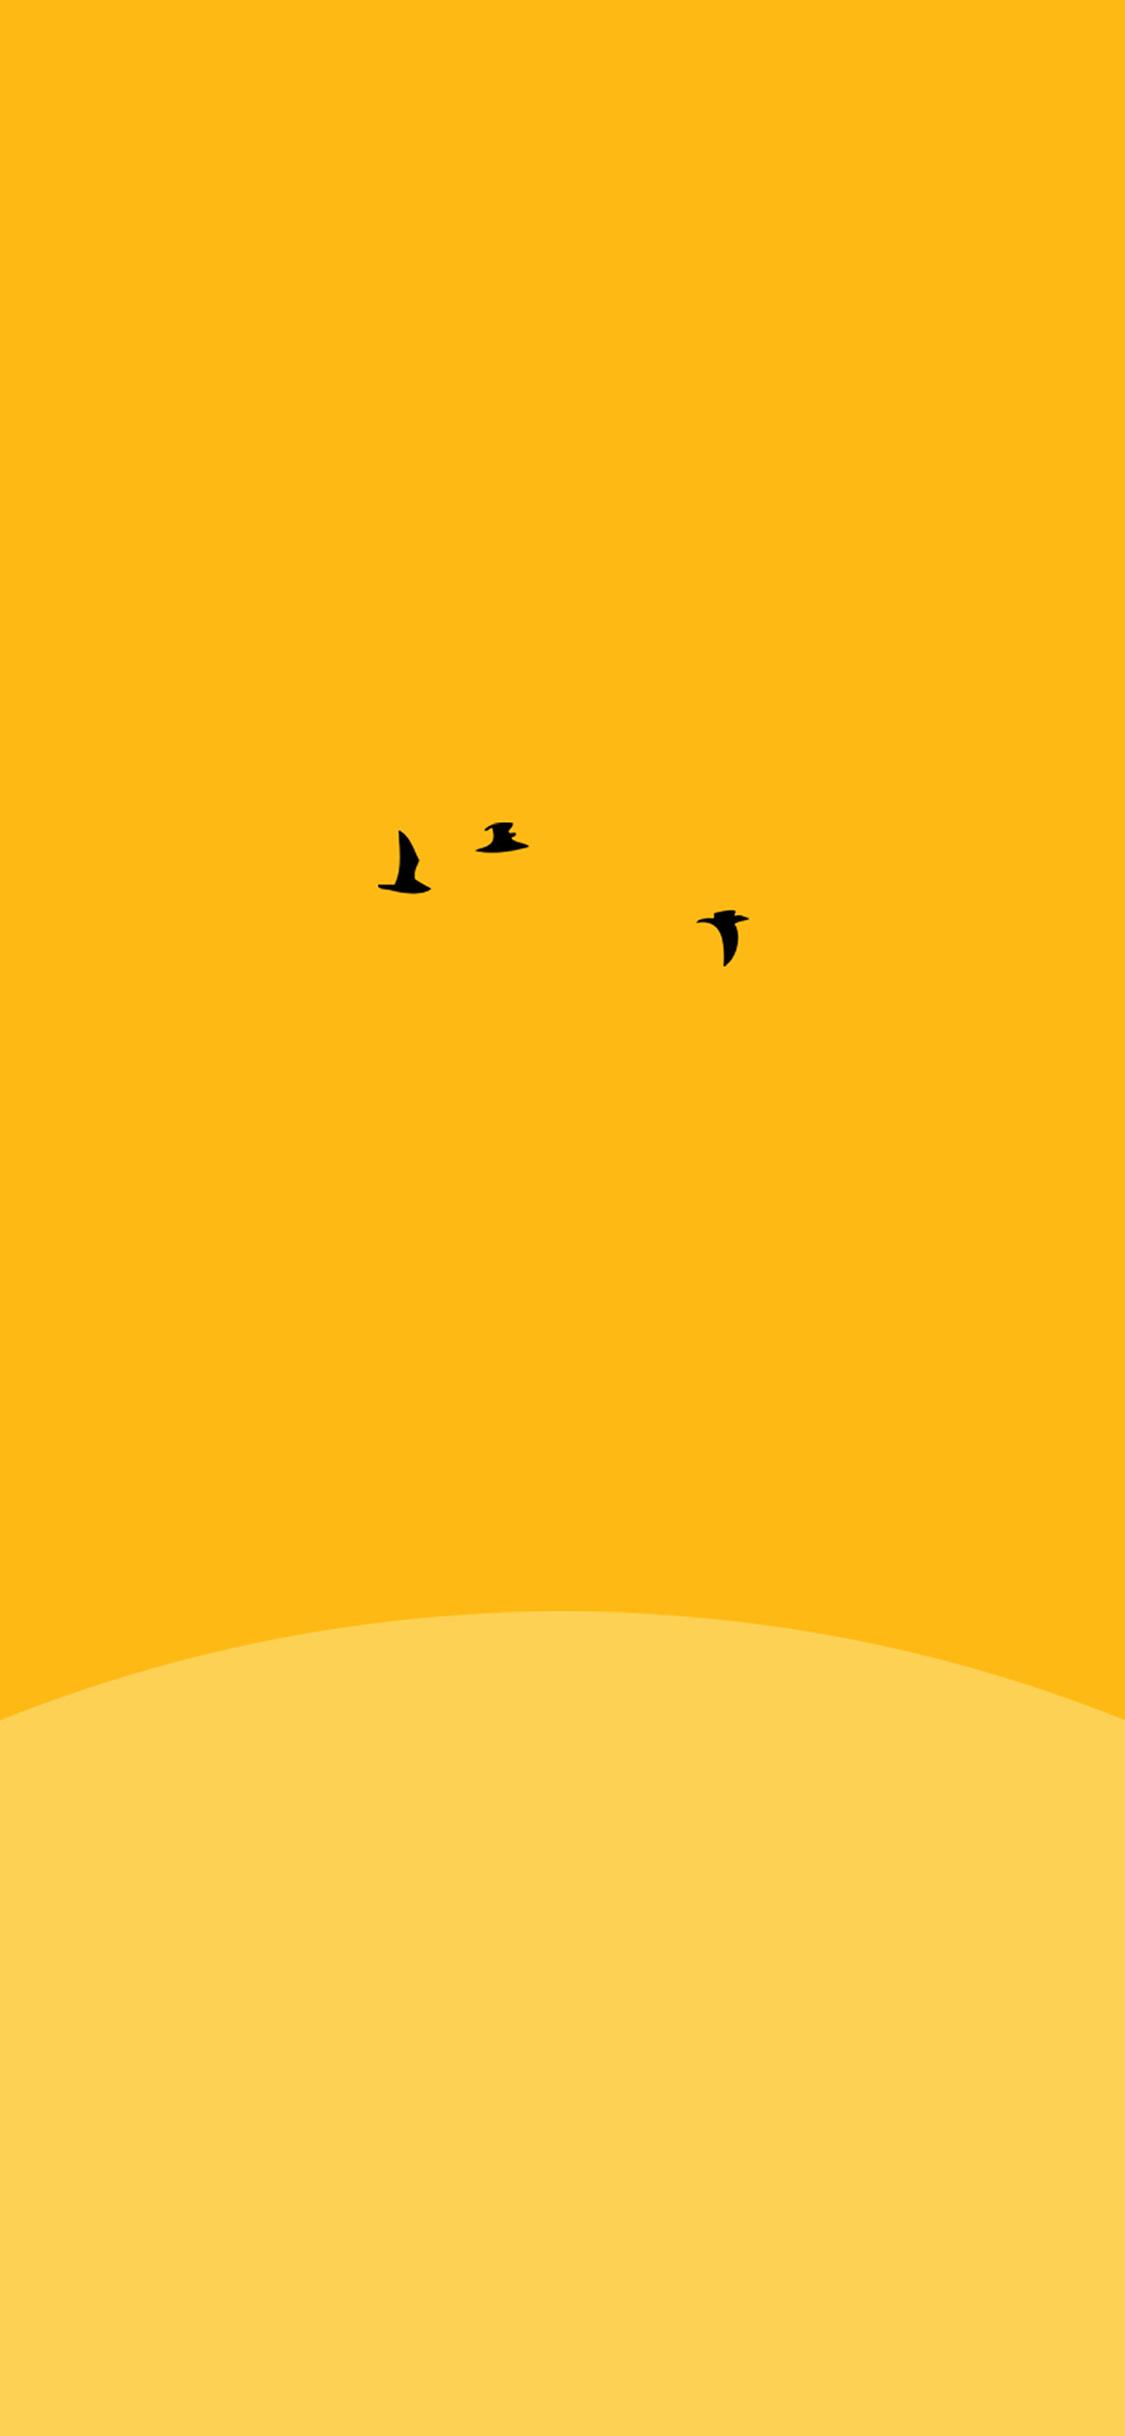 Simple Wallpaper Bird Minimalist - papers  Trends_543225.jpg